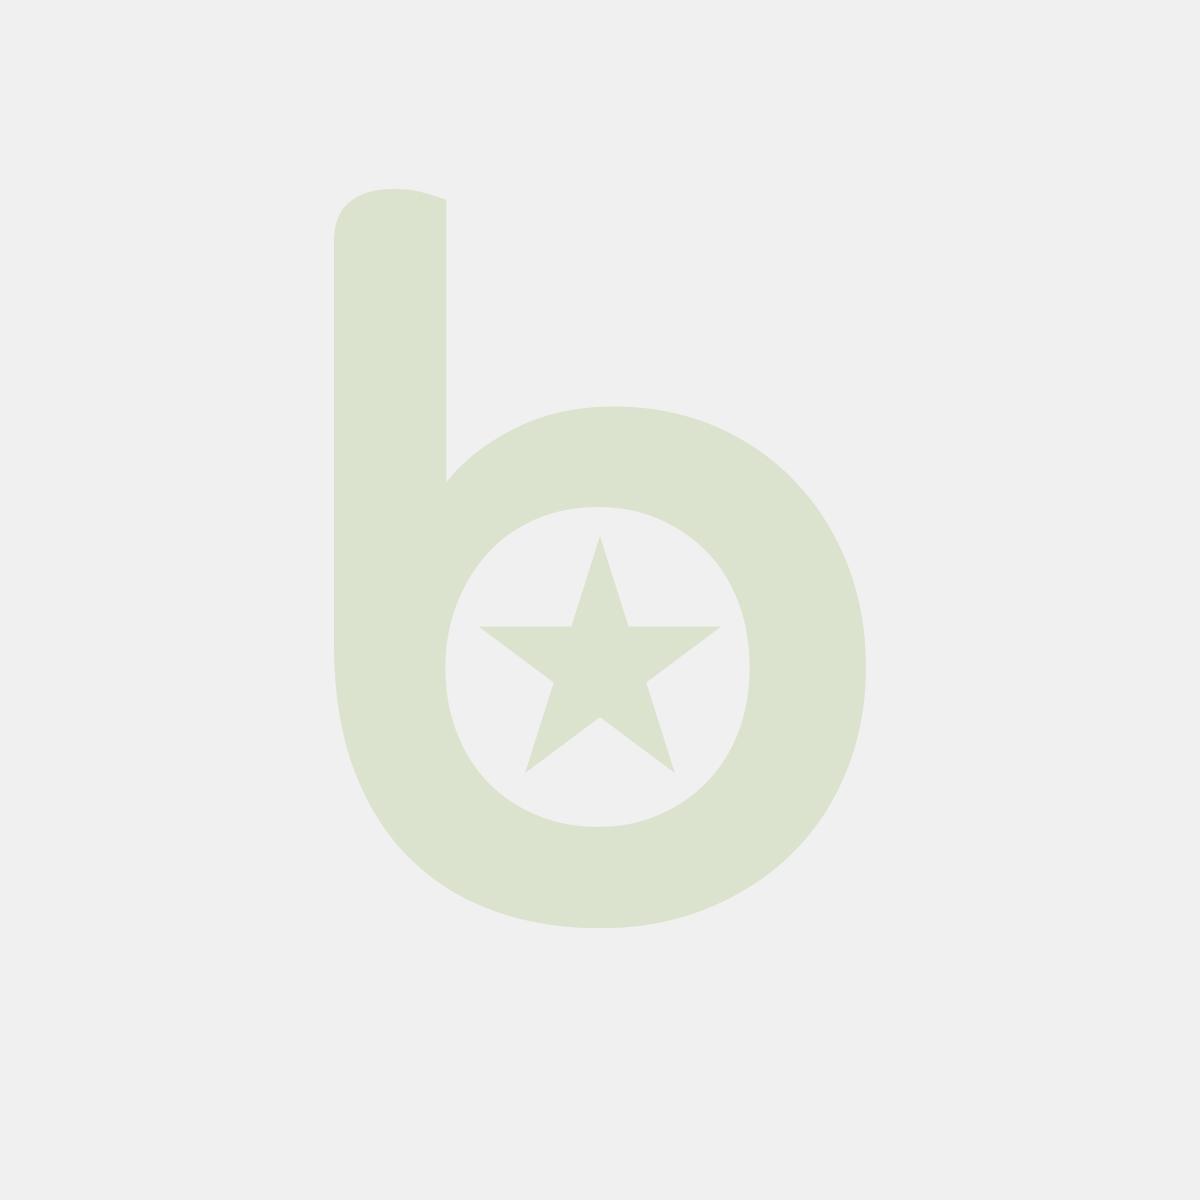 Schładzarka szokowa NANO 3x GN 1/1